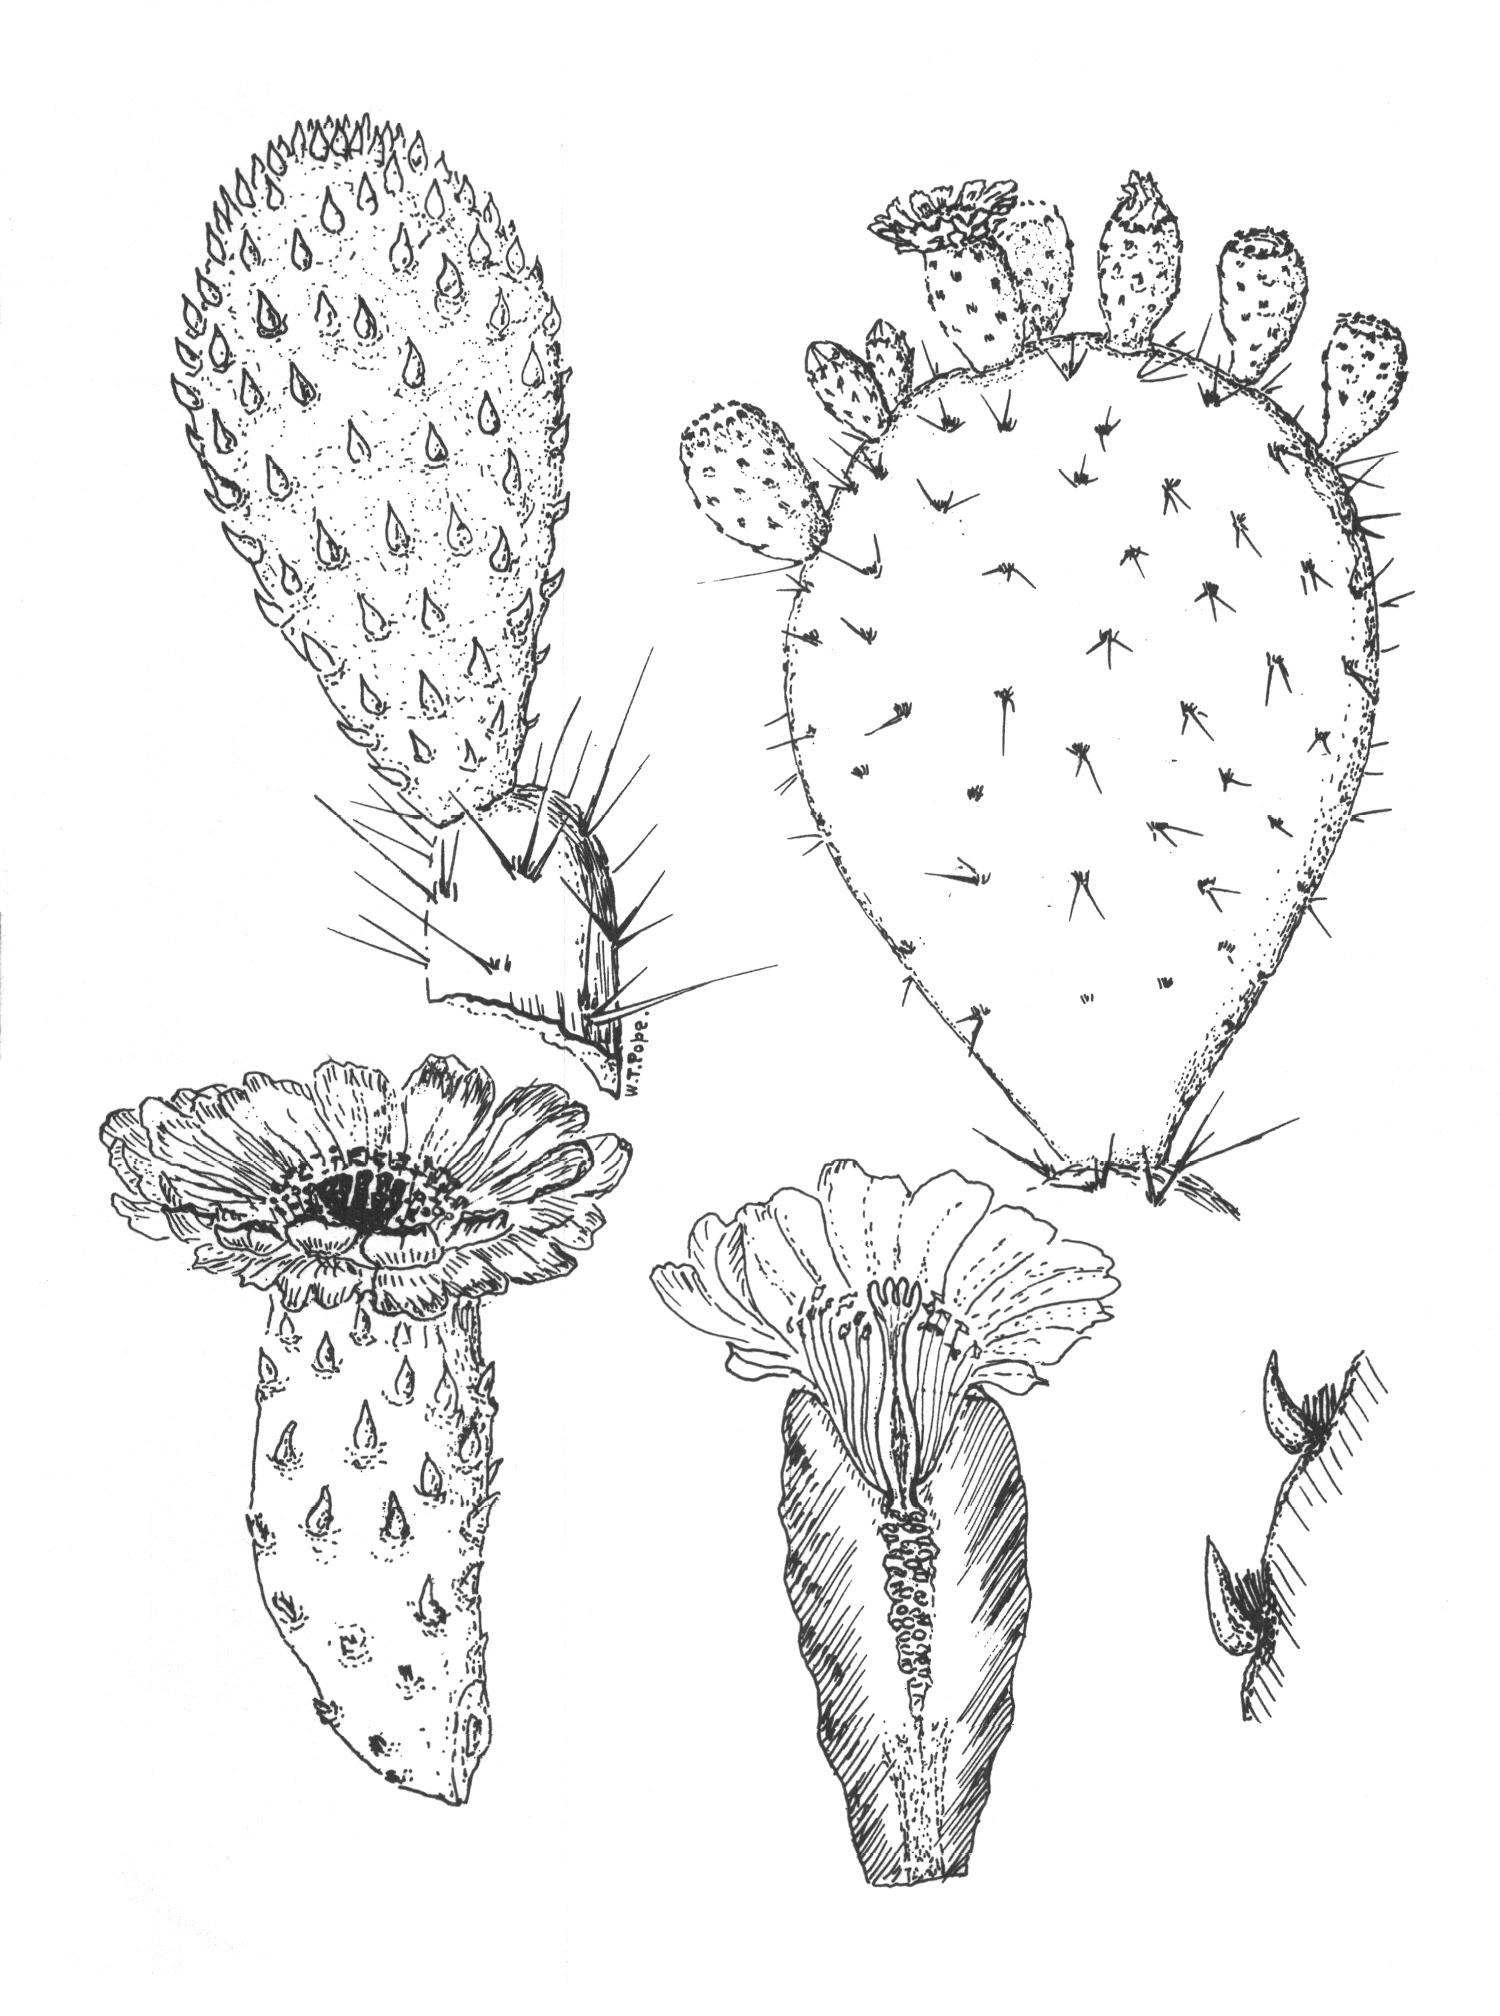 Drawn cactus prickly pear cactus Pear ideas desert  Prickly